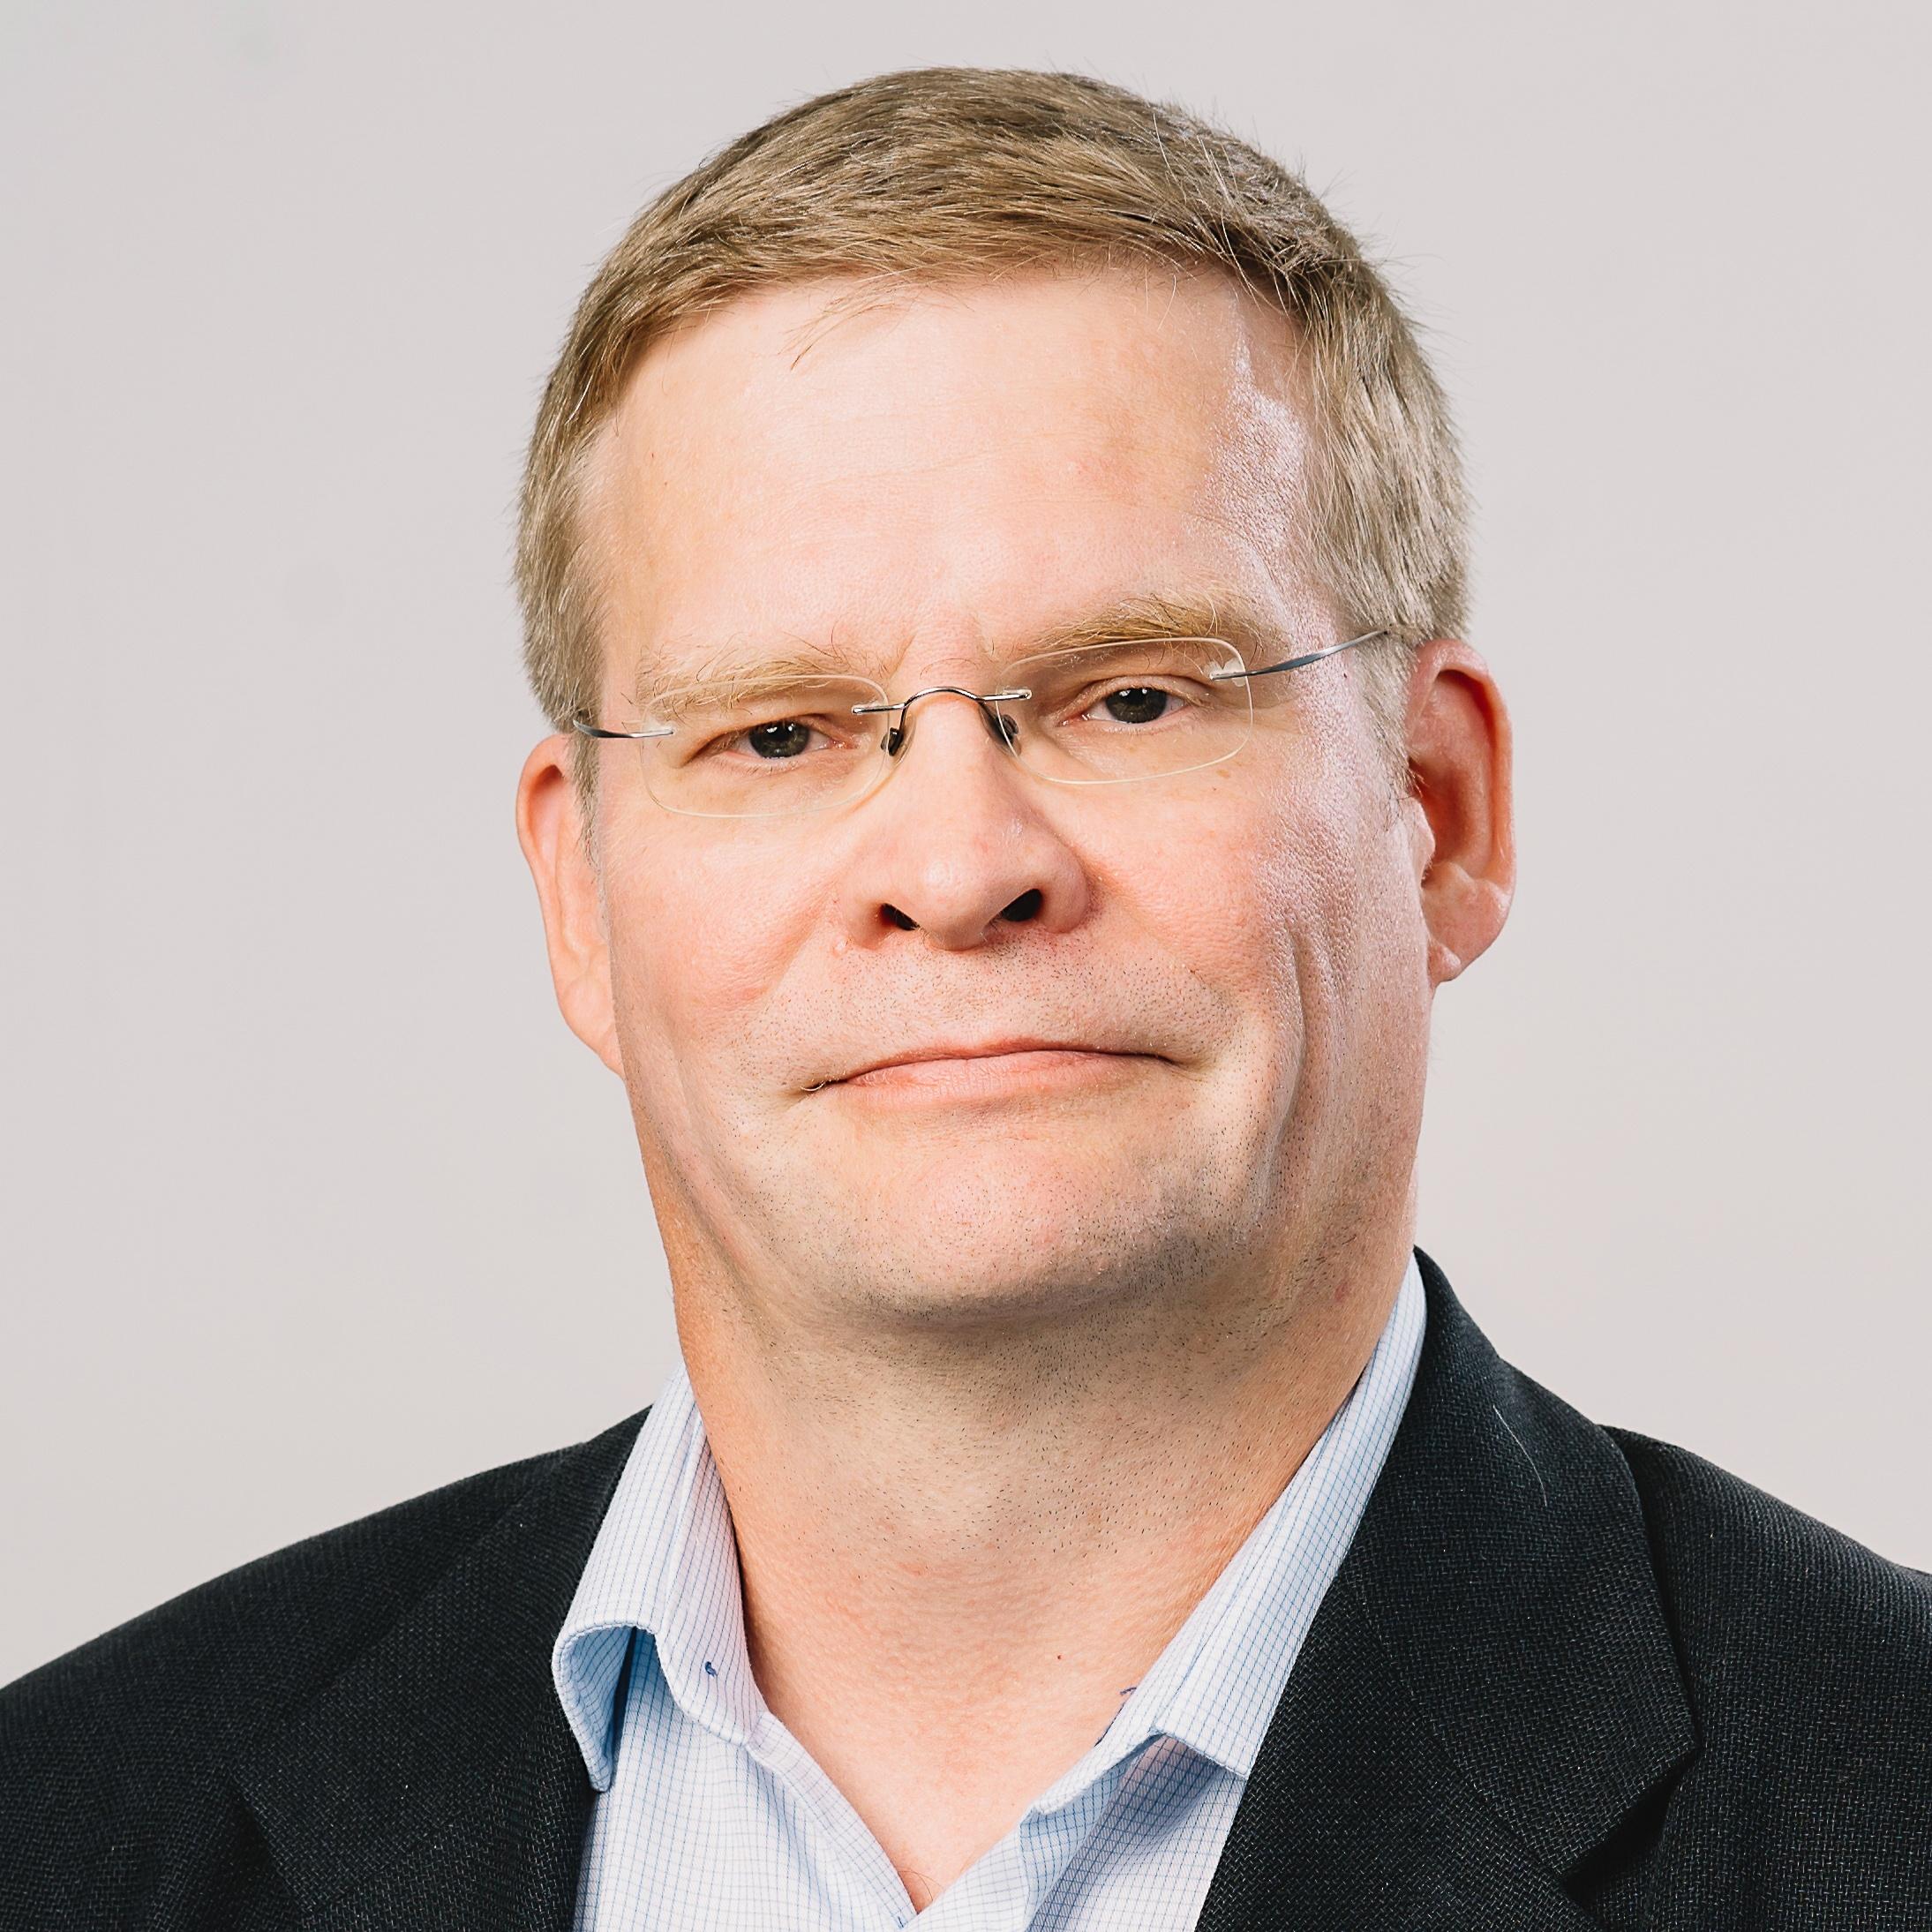 Timo-Pitkanen